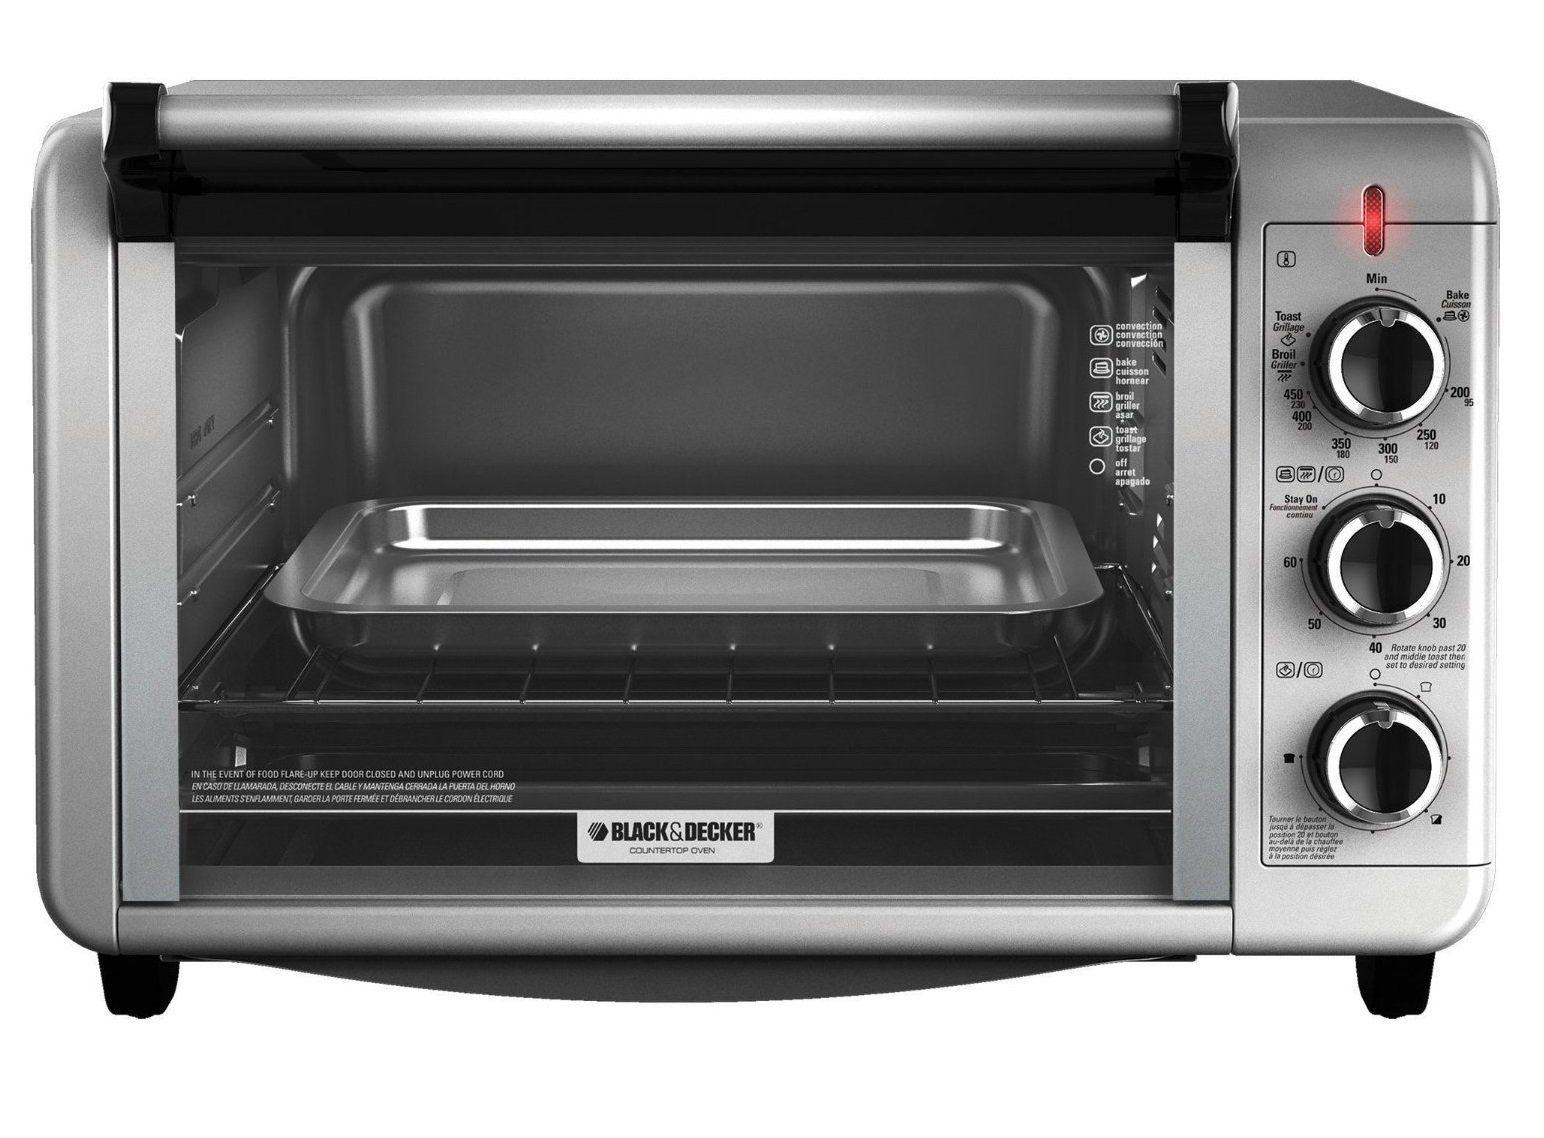 Black Decker To3210ssd Metal Toaster Oven Broiler 6 Slice